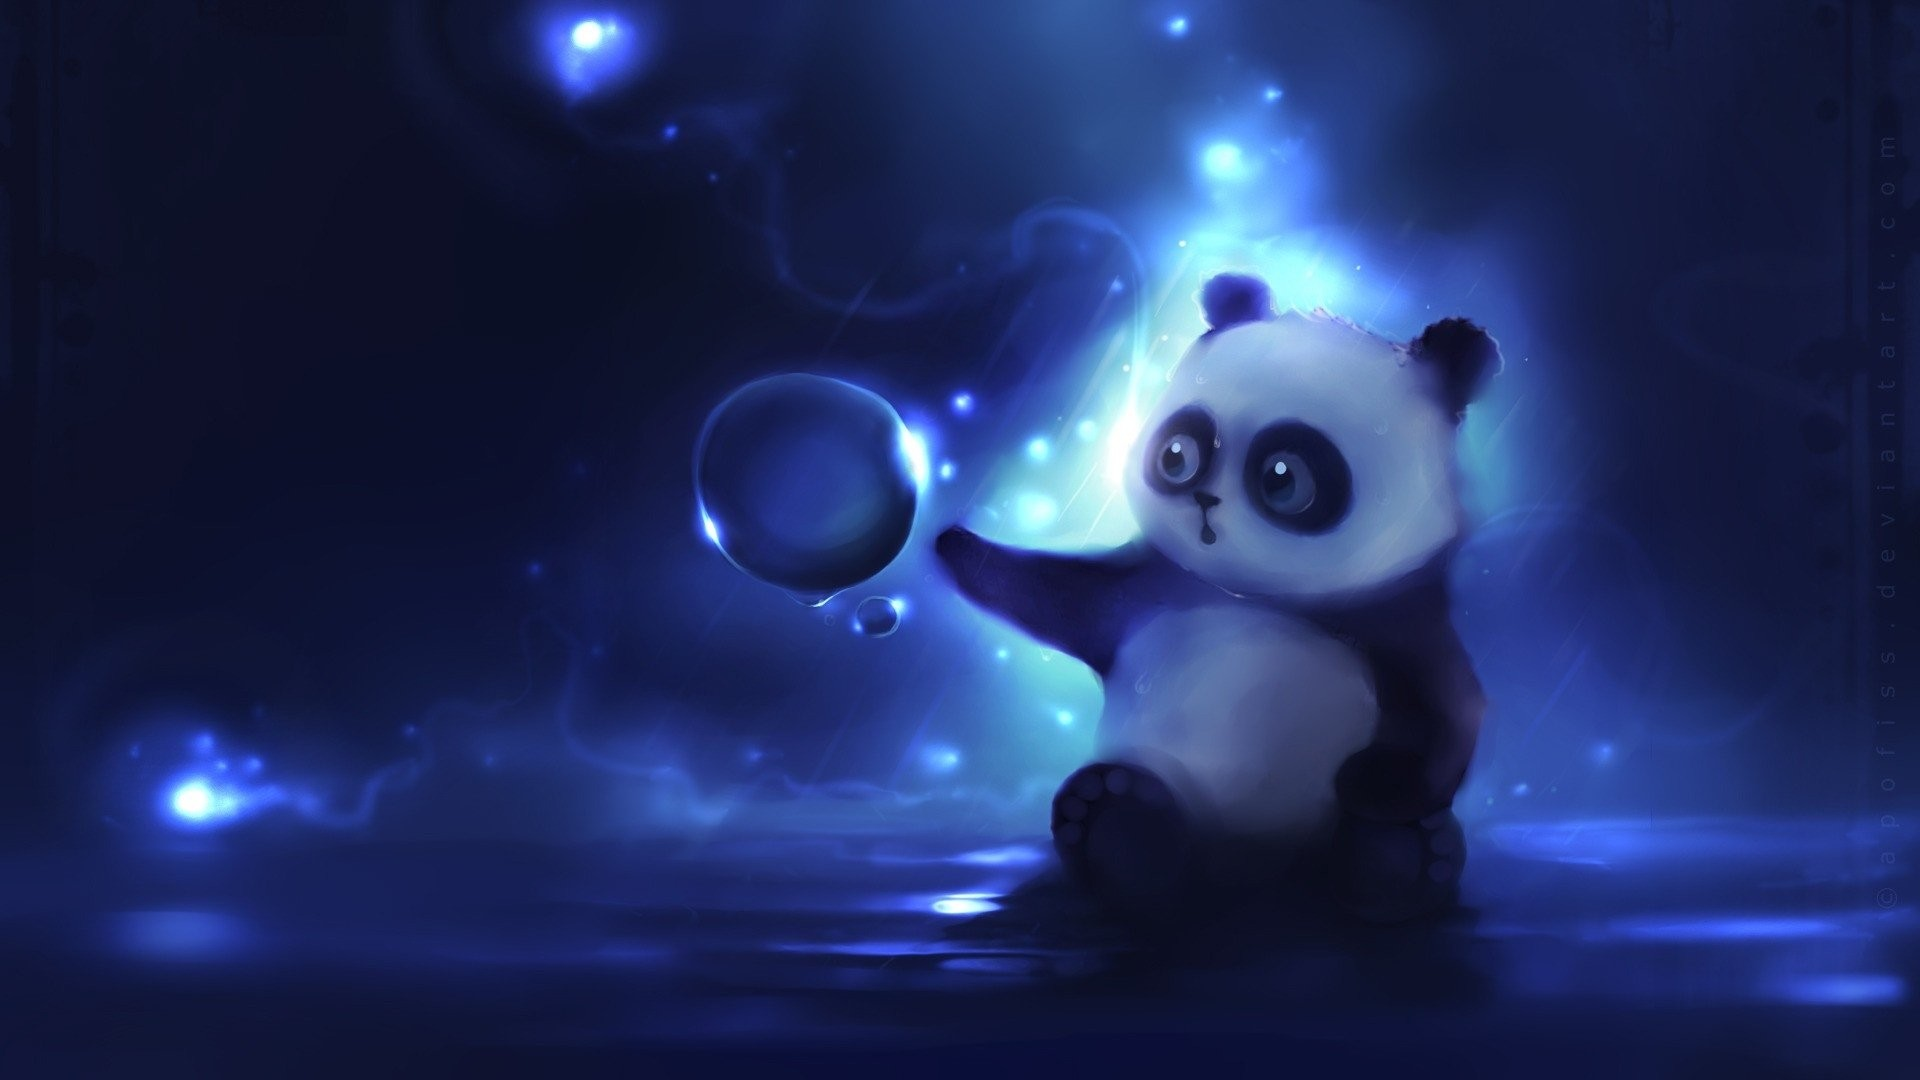 Animated panda wallpaper 68 images - Panda anime wallpaper ...